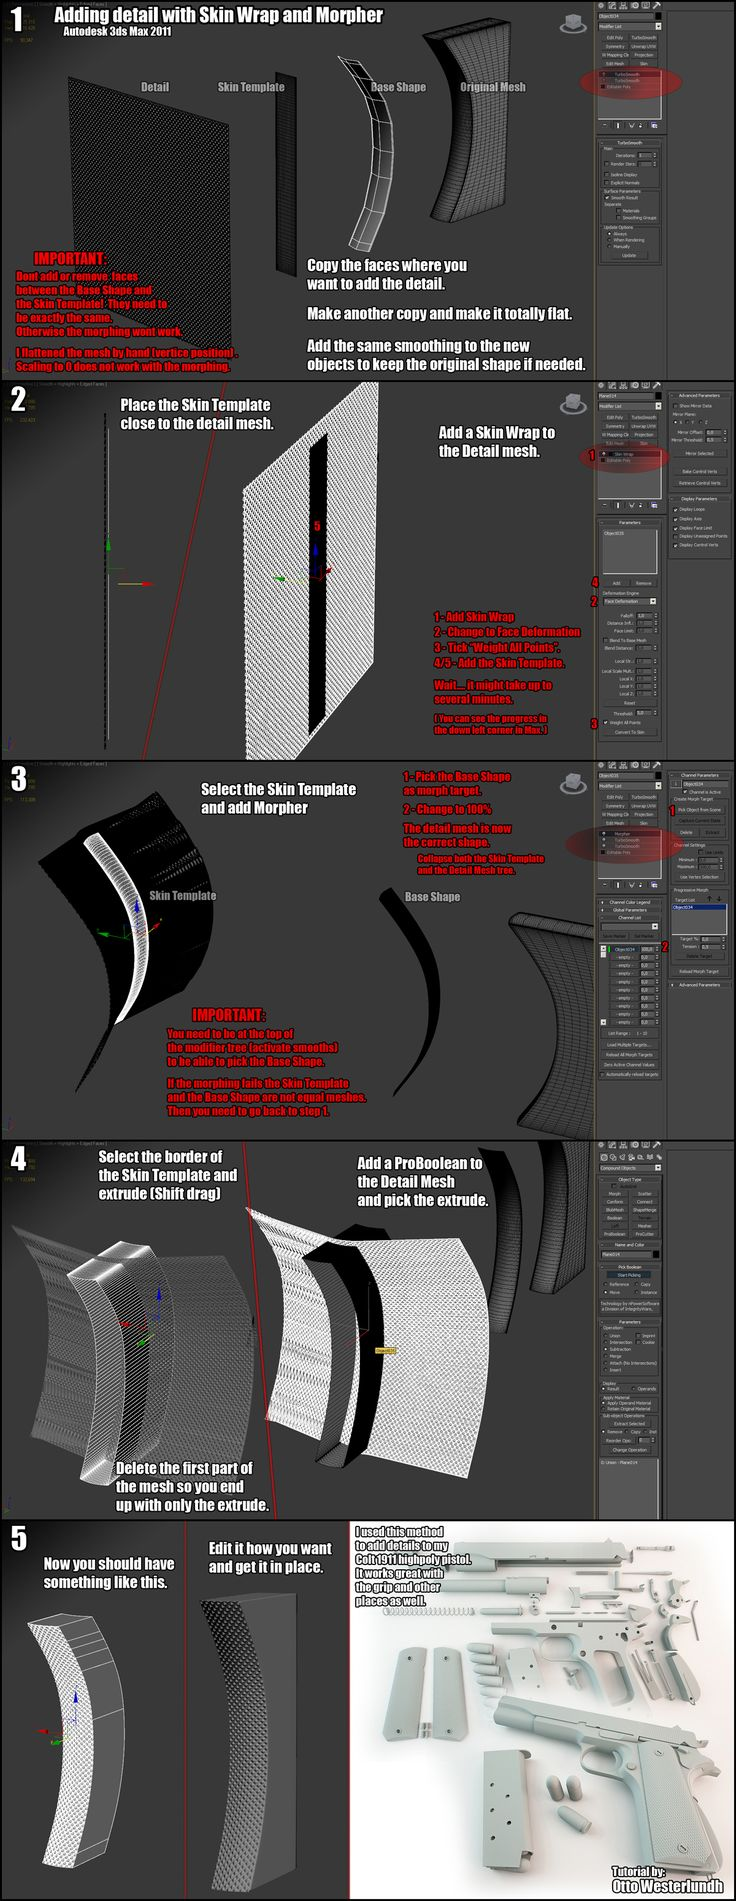 FAQ: How u model dem shapes? Hands-on mini-tuts for mechanical sub-d AKA ADD MORE GEO - Page 85 - Polycount Forum